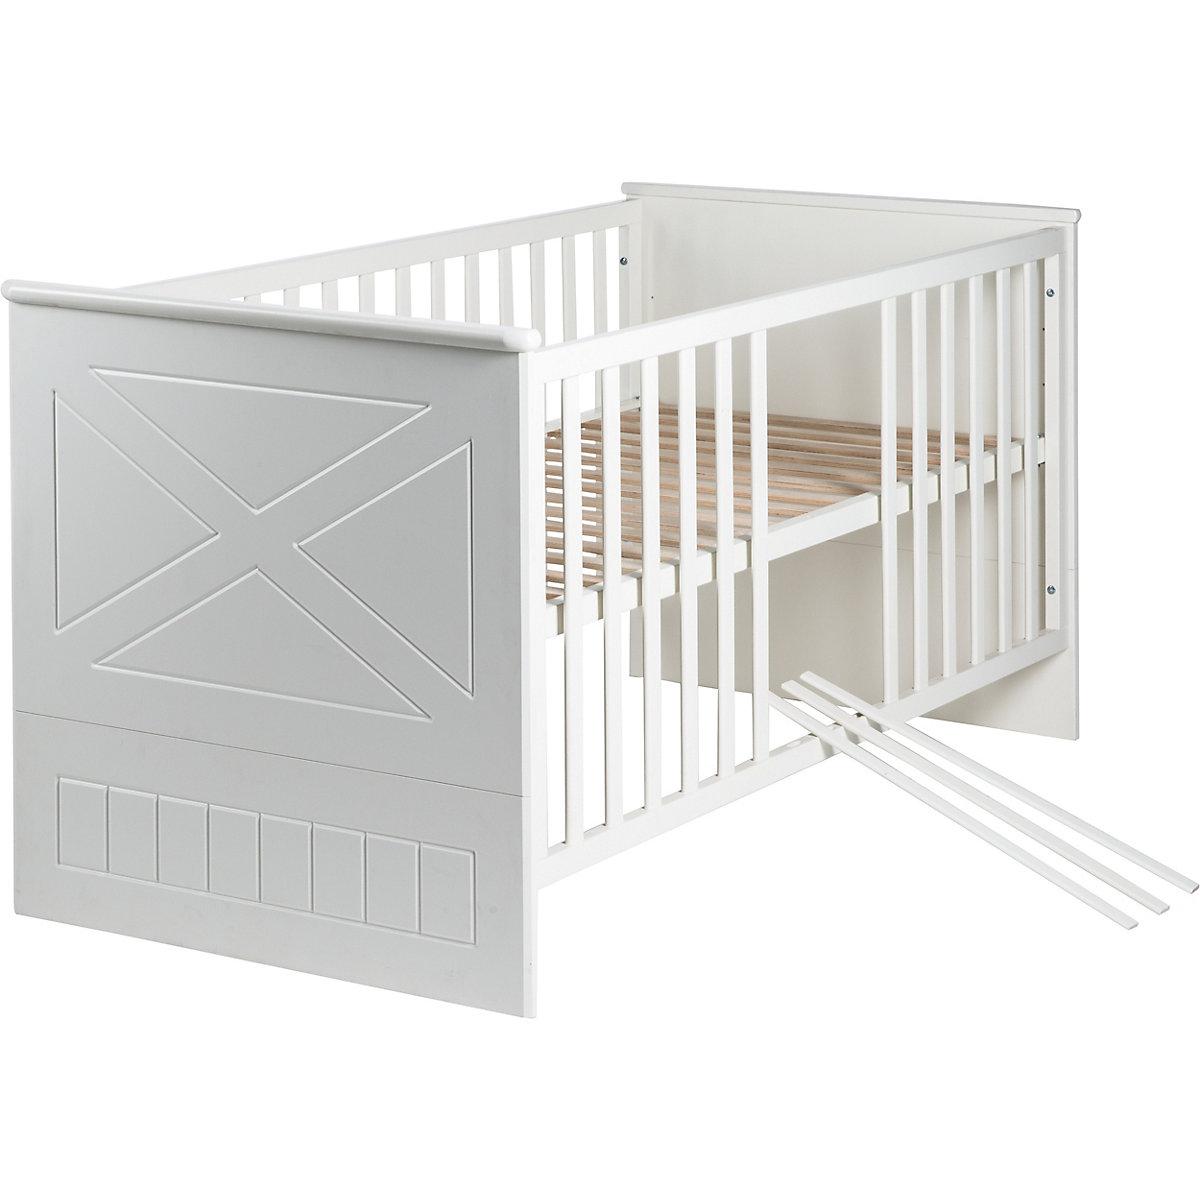 Angebot Kinderbett CONSTANTIN, 70 x 140 cm weiß/Canadian white, Roba   qbbwC